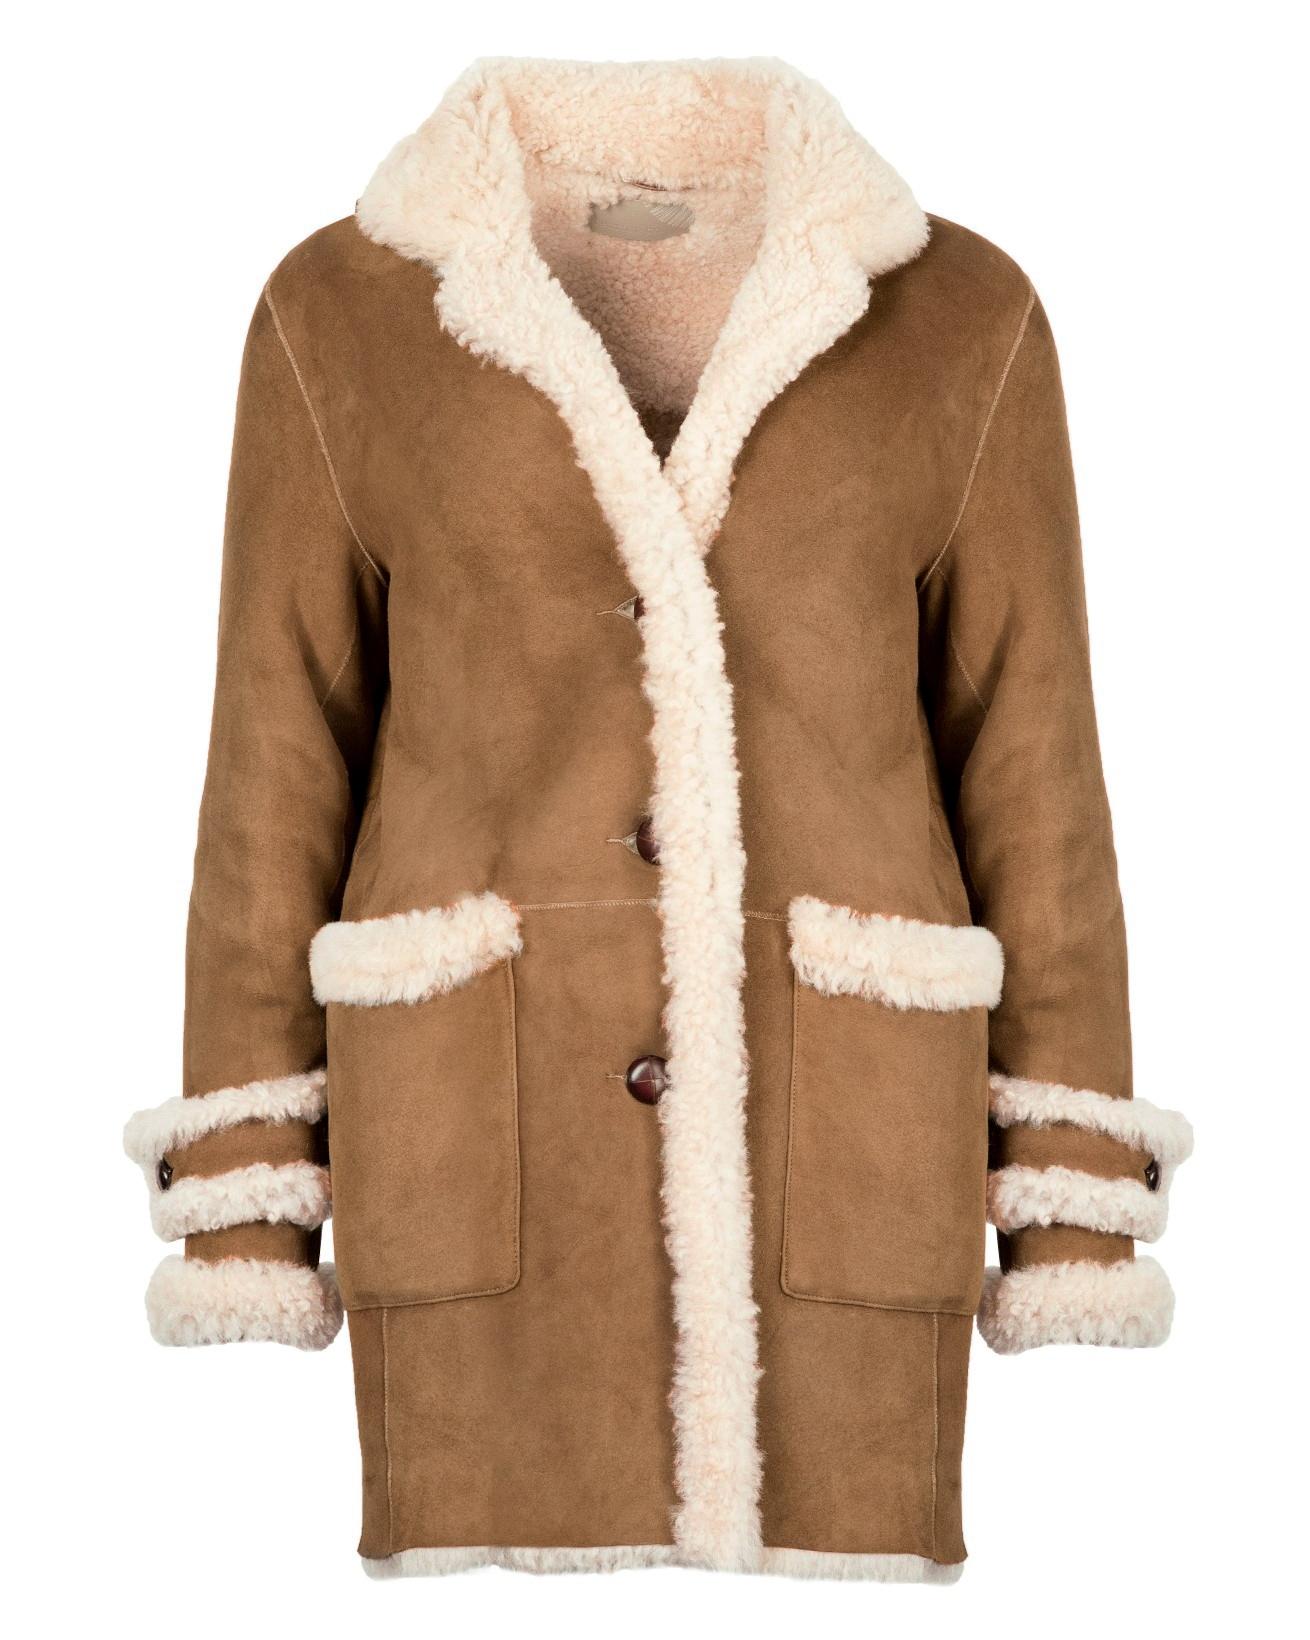 7408_vintage box sheepskin coat_front_aw17.jpg